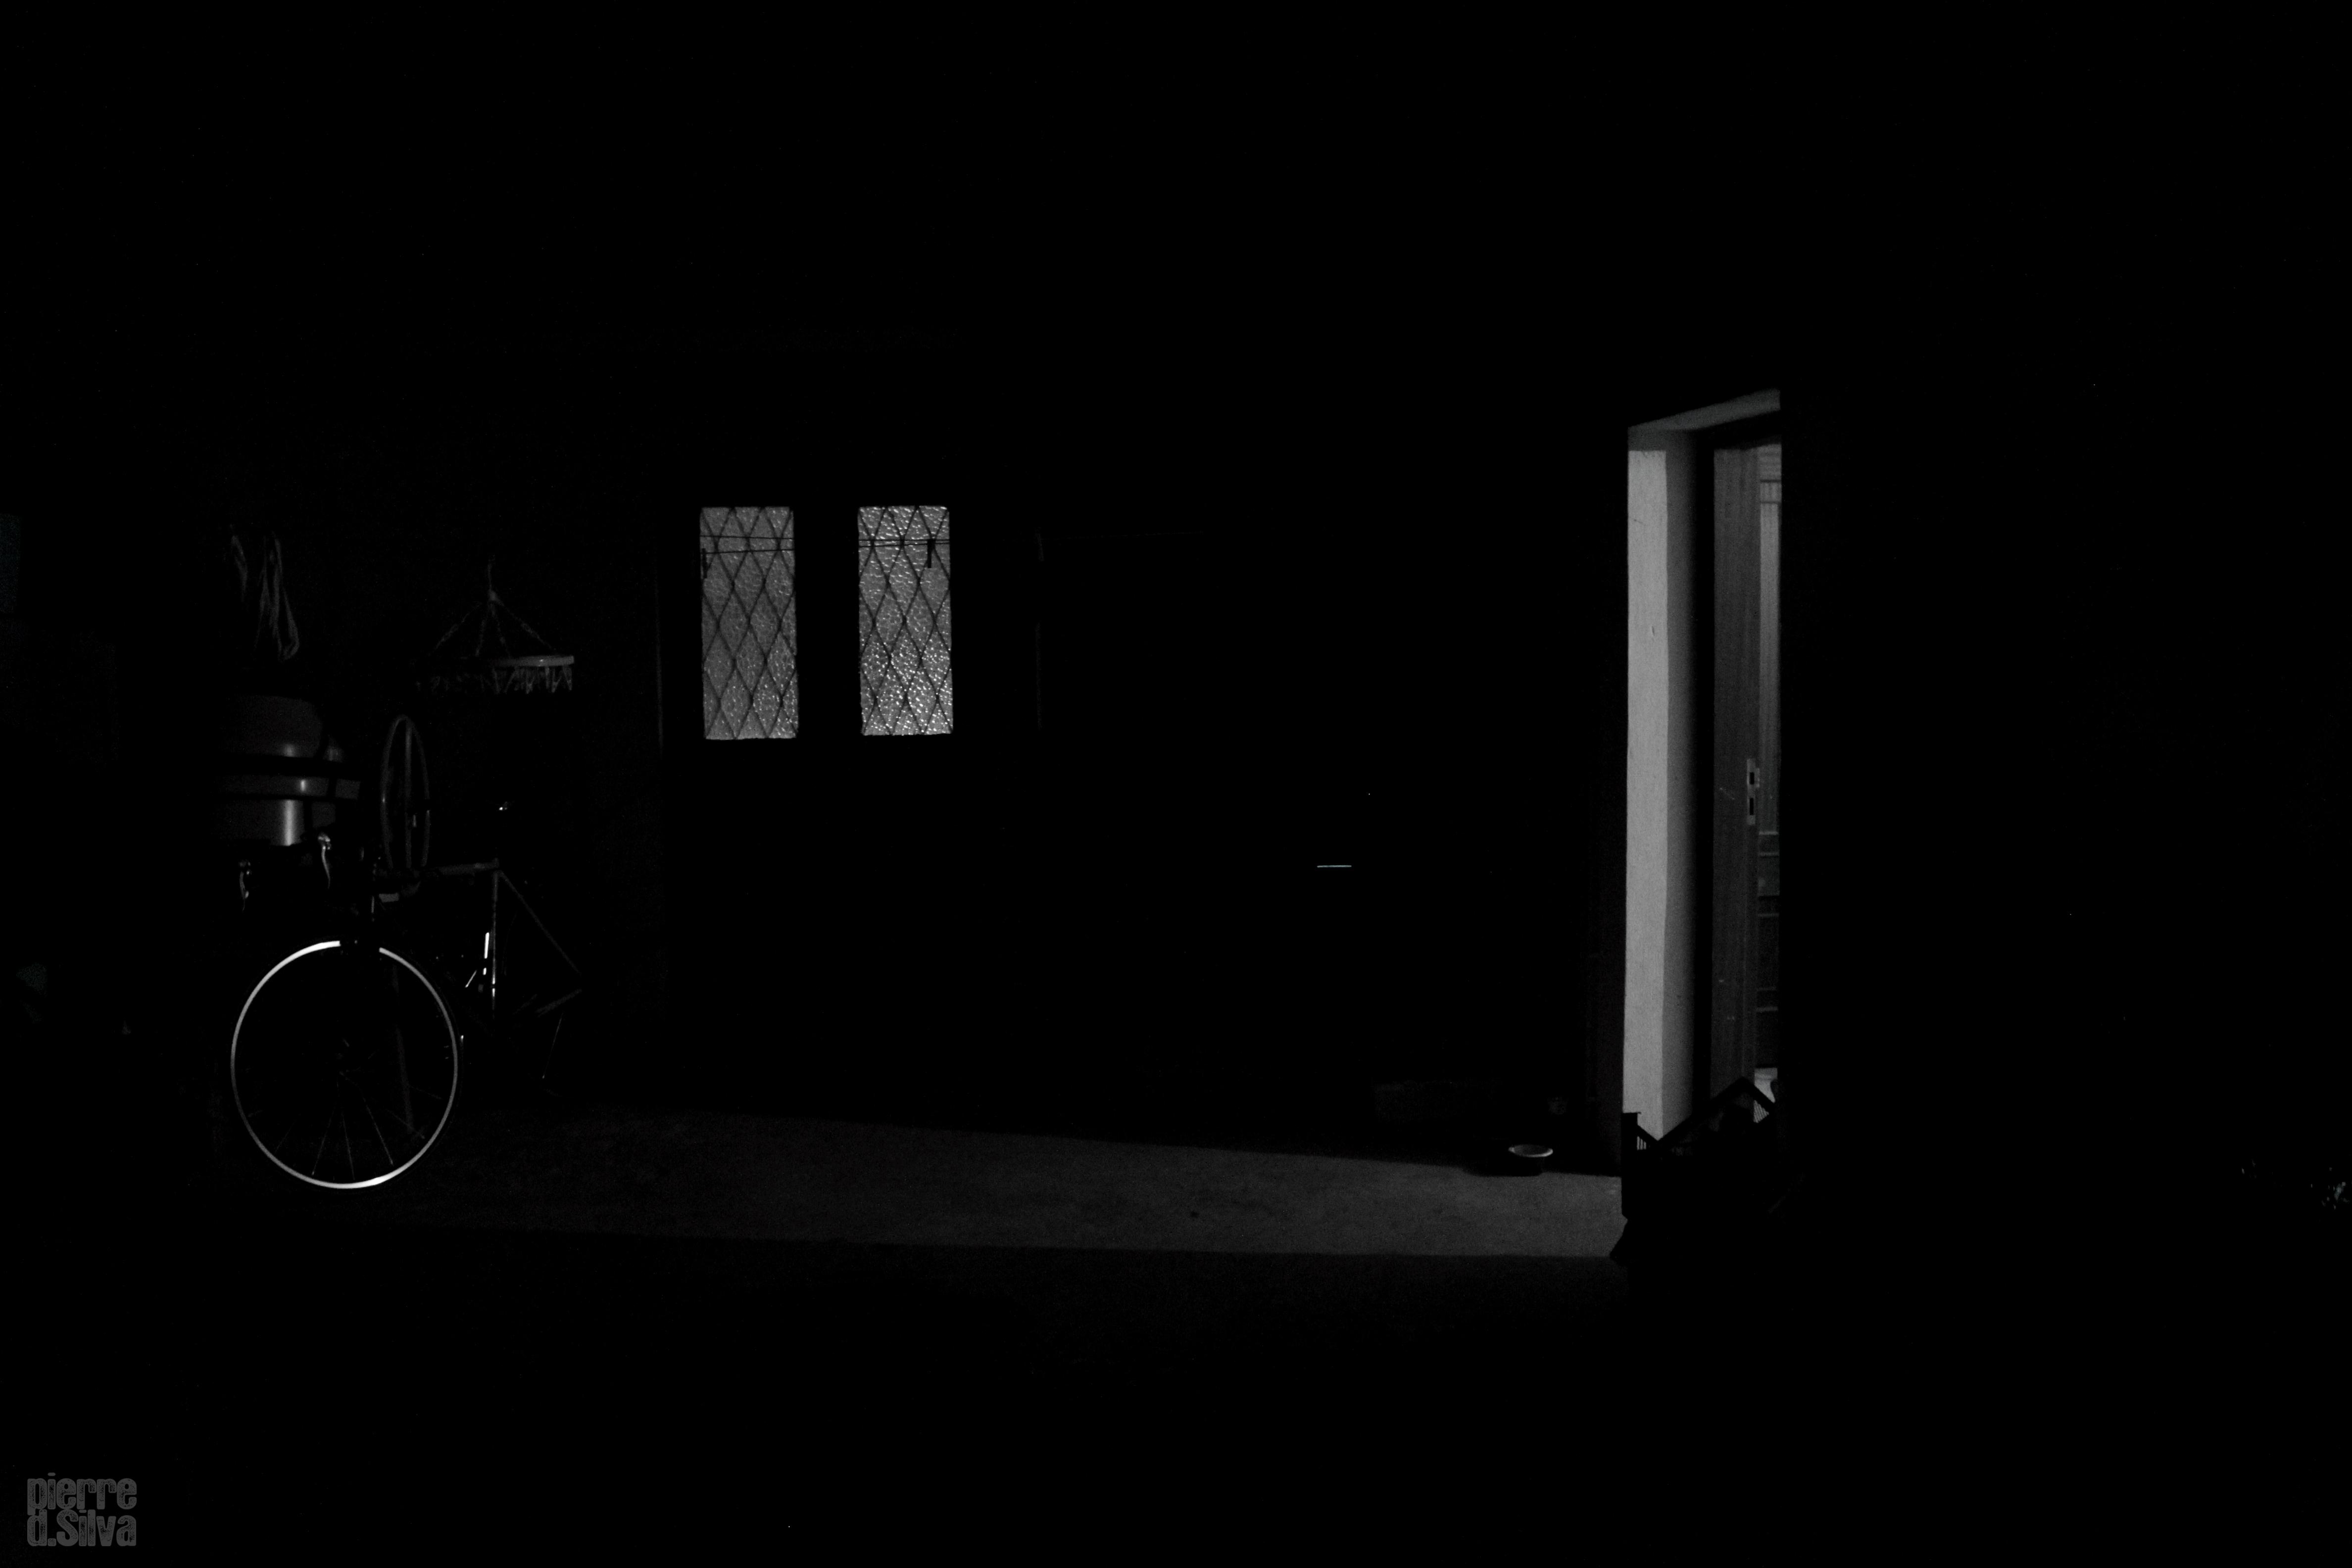 dark door by pierreds dark door by pierreds & dark door by pierreds on DeviantArt